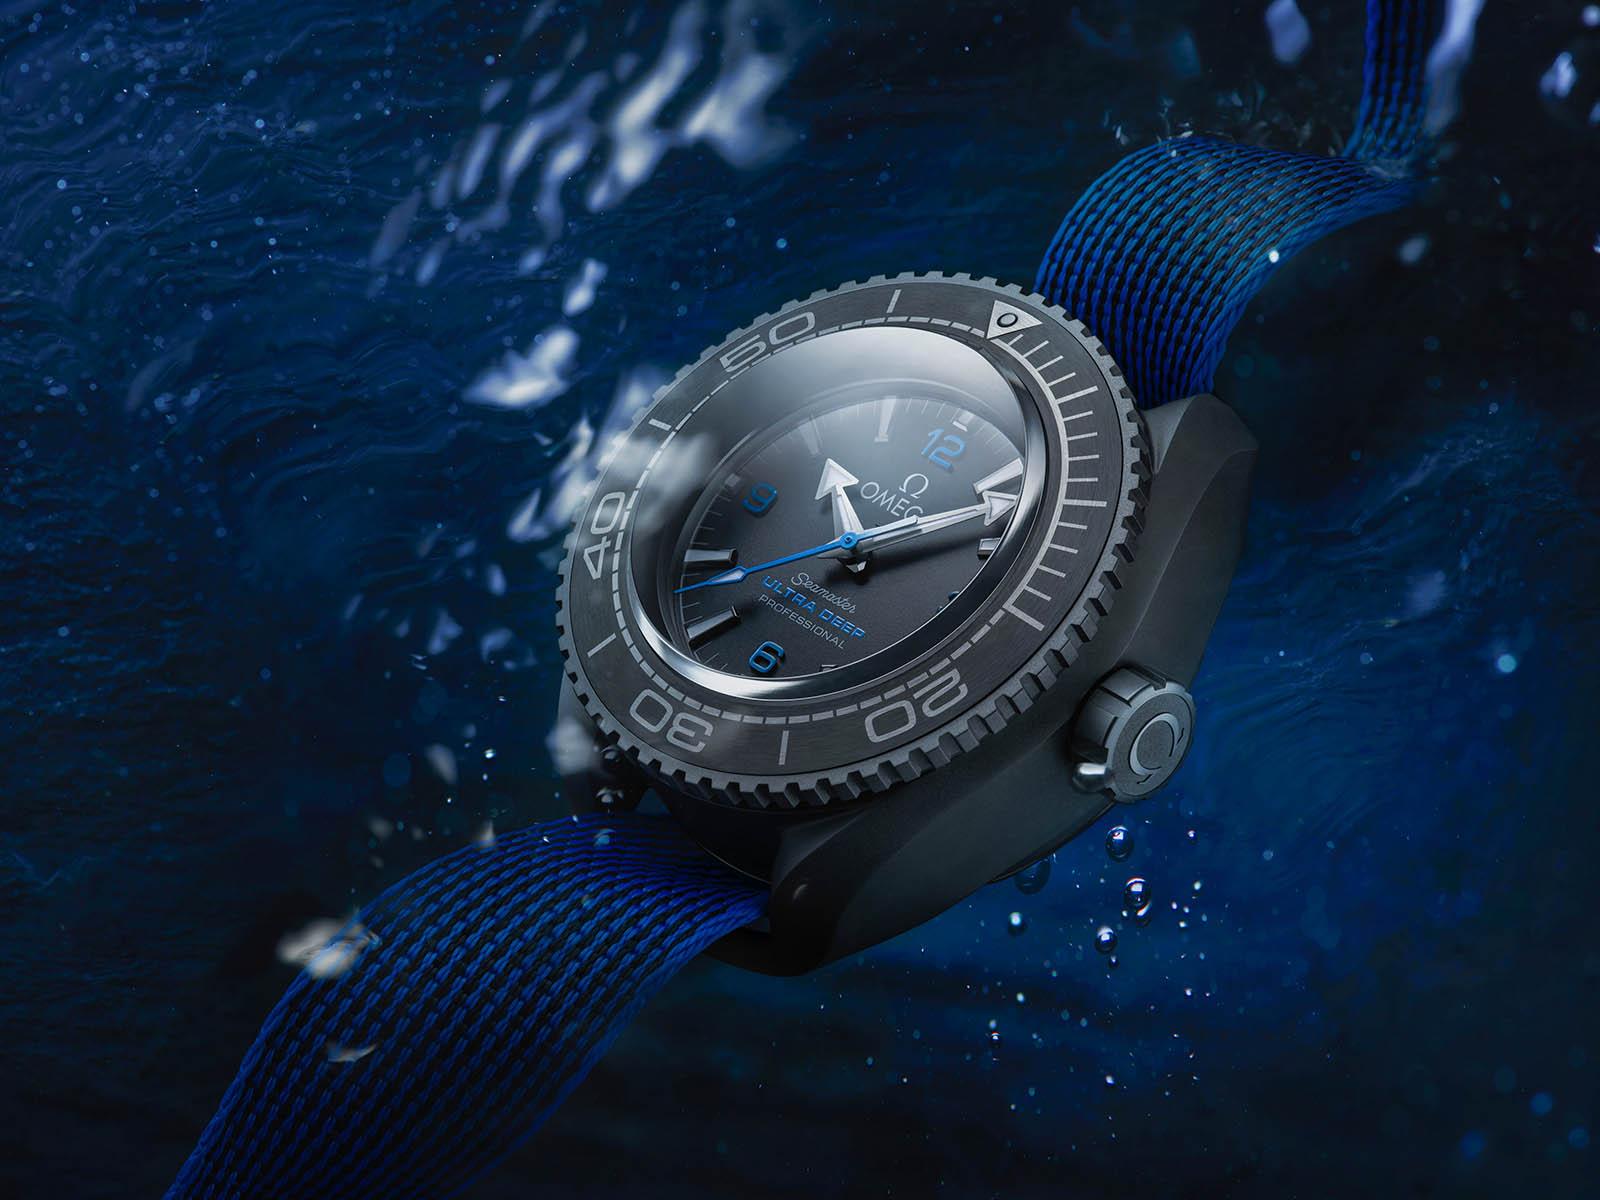 omega-seamaster-planet-ocean-ultra-deep-professional-2.jpg